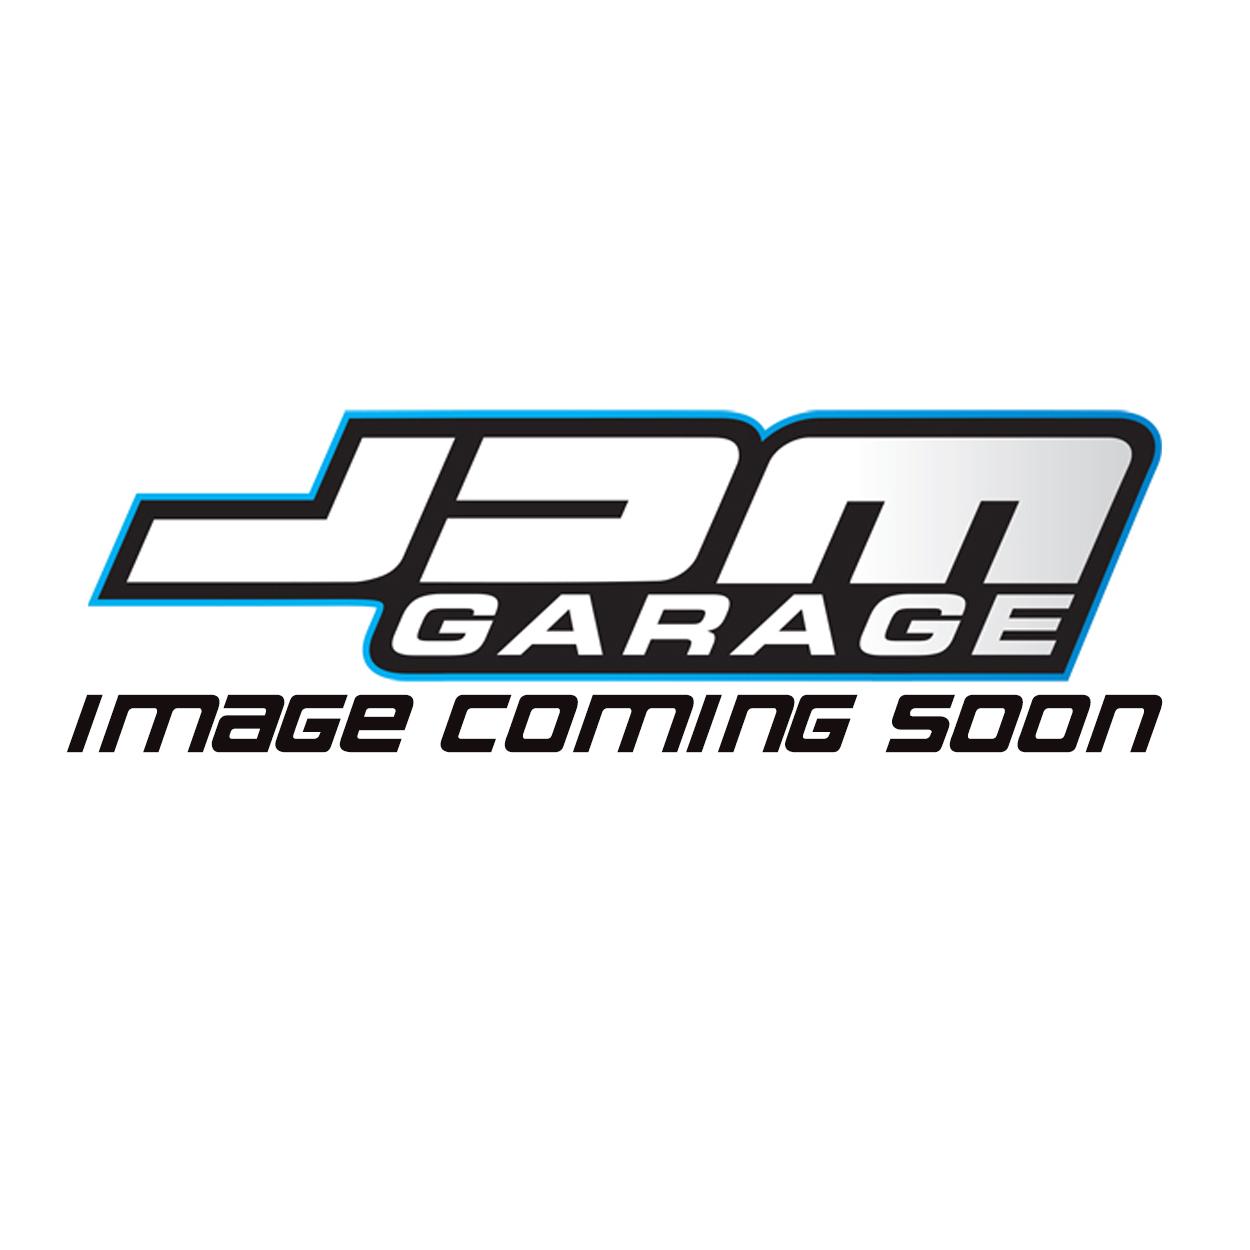 JDMGarageUK BW Cat Glitter Sticker